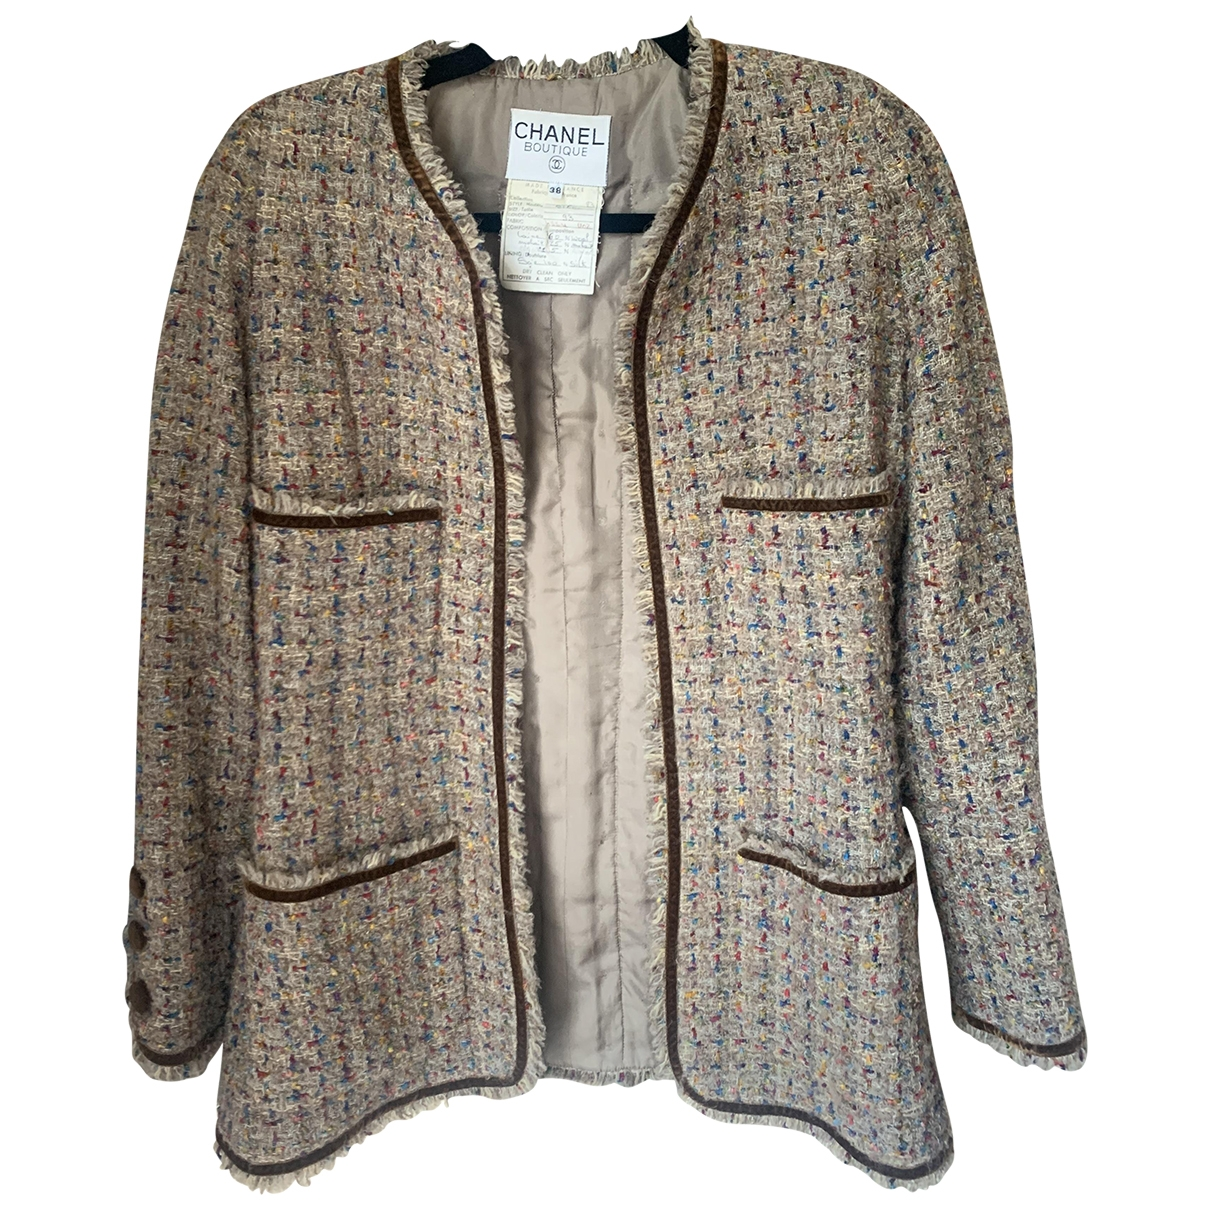 Chanel \N Tweed jacket for Women 38 FR